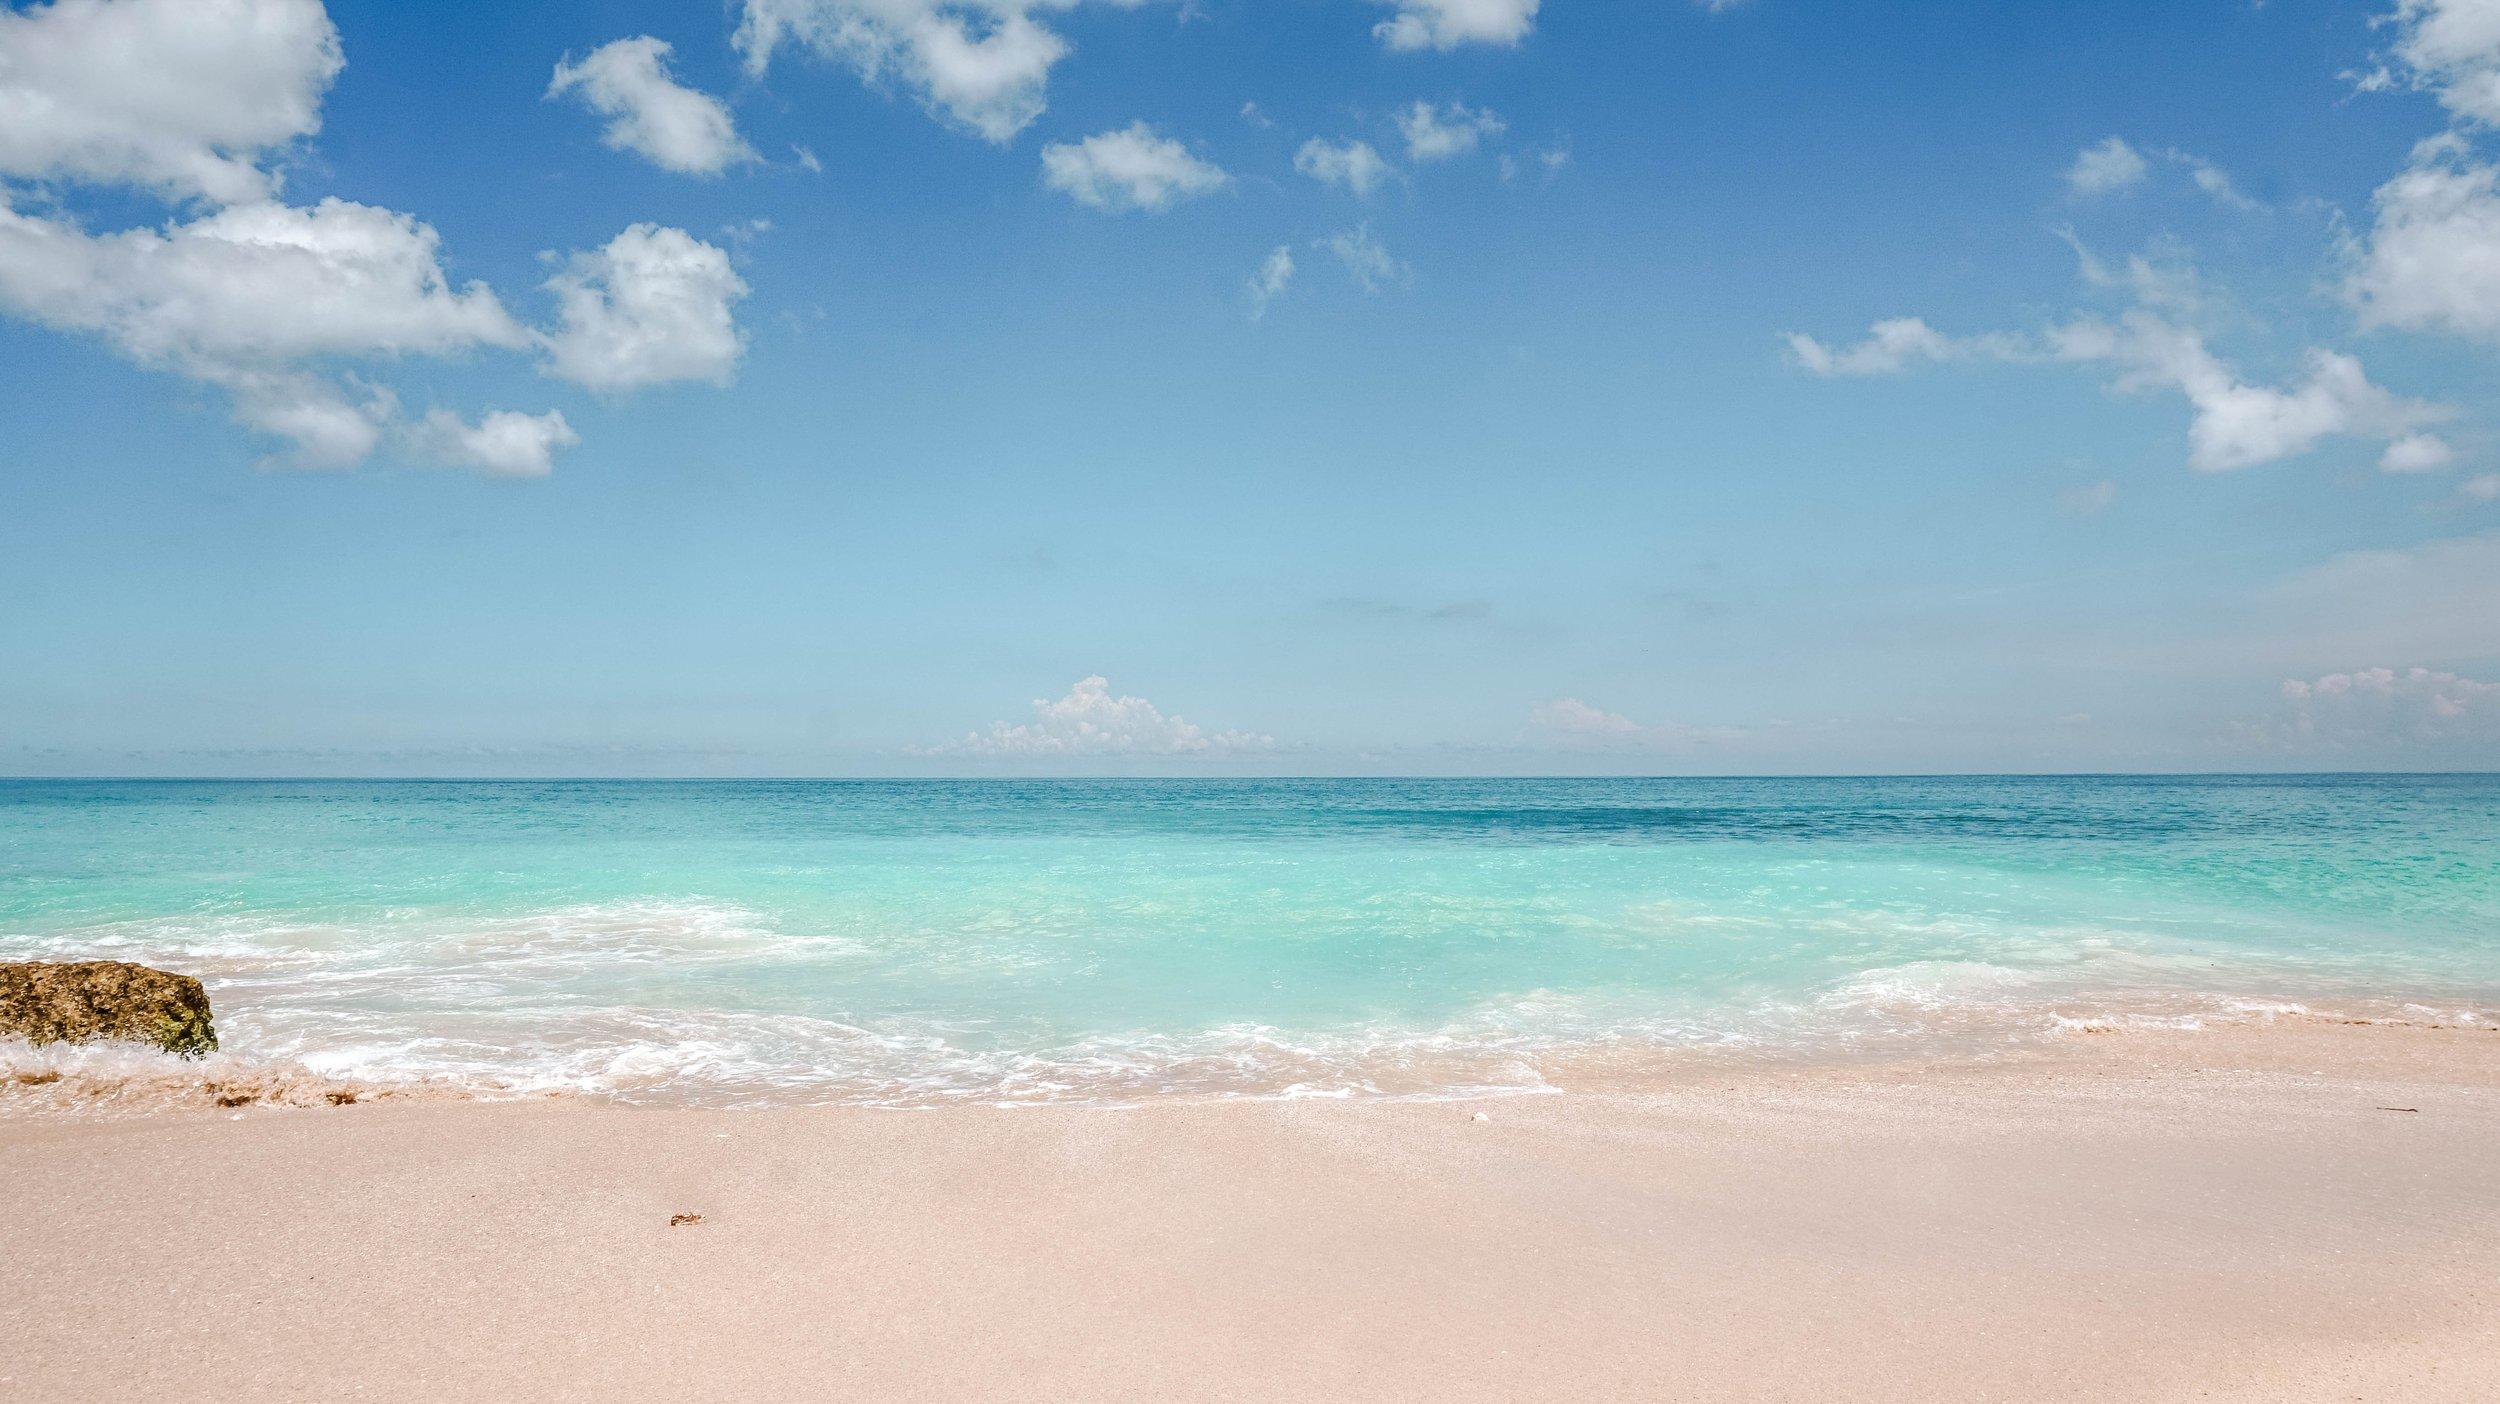 dreamland-beach-bali-uluwatu-2018.jpg